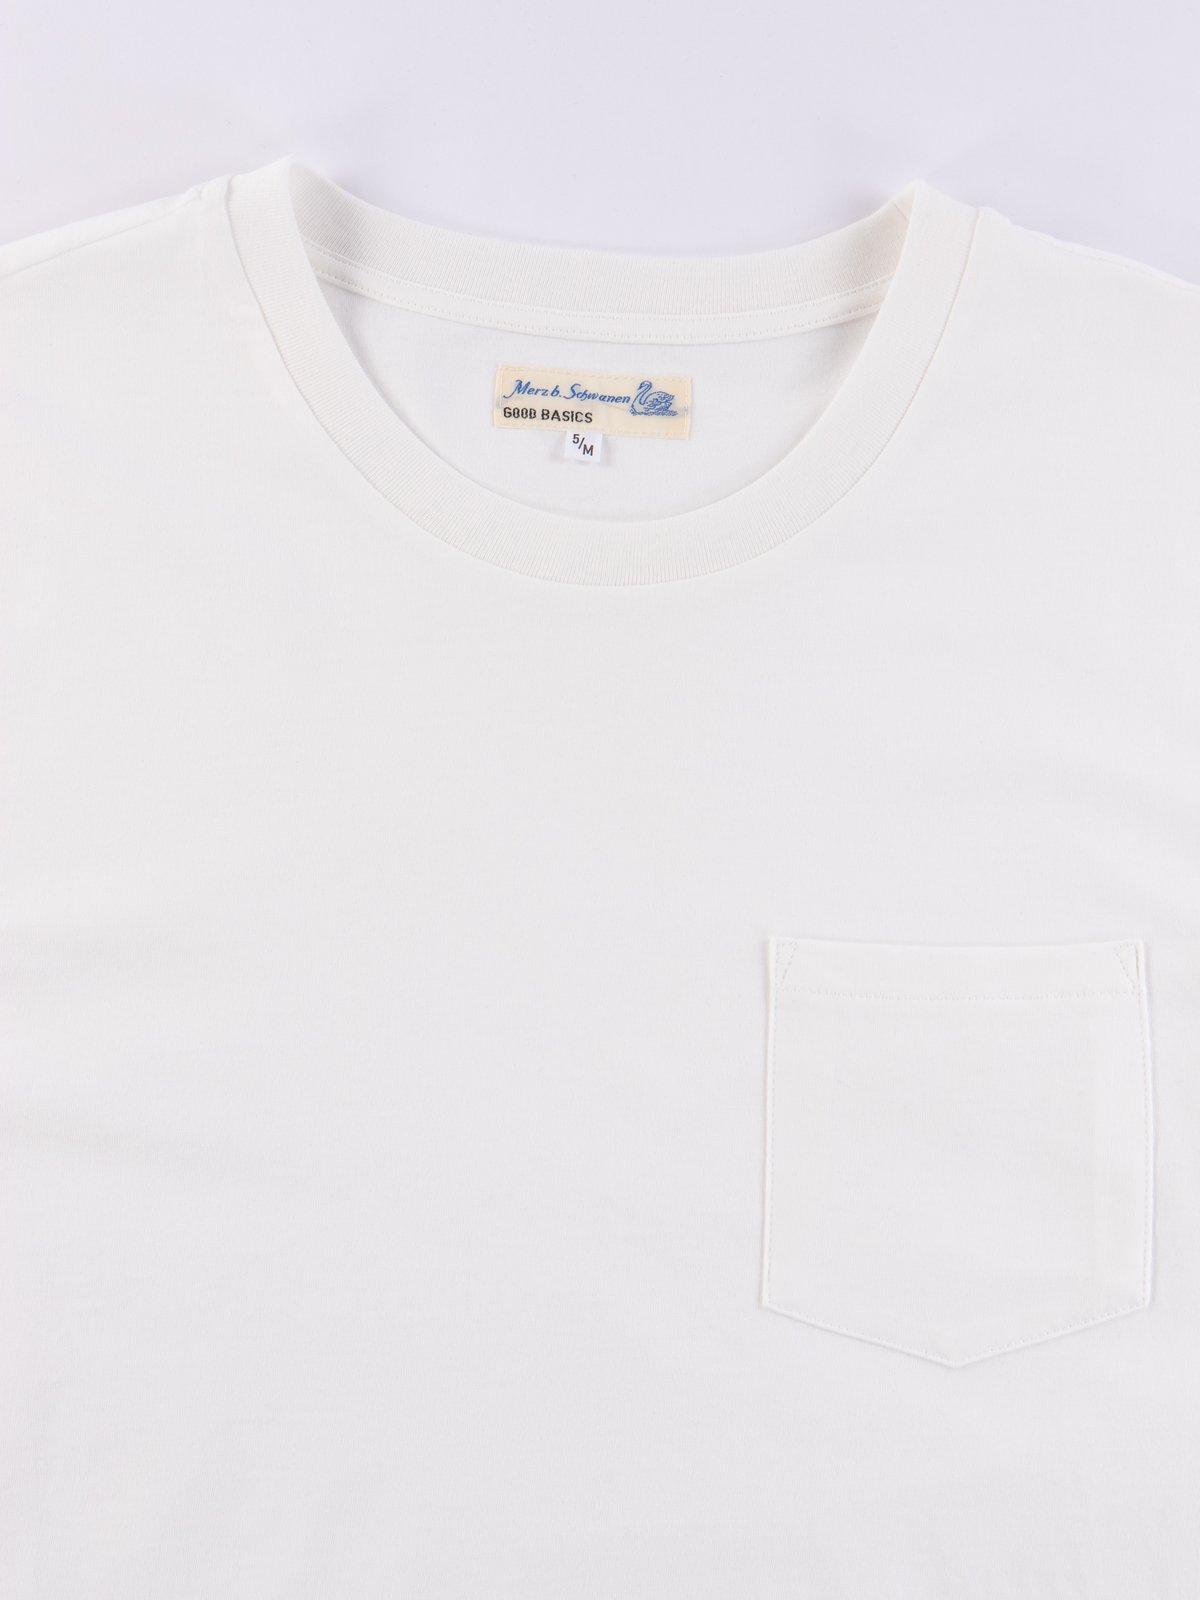 White Good Basics CTP01 Pocket Crew Neck Tee - Image 3